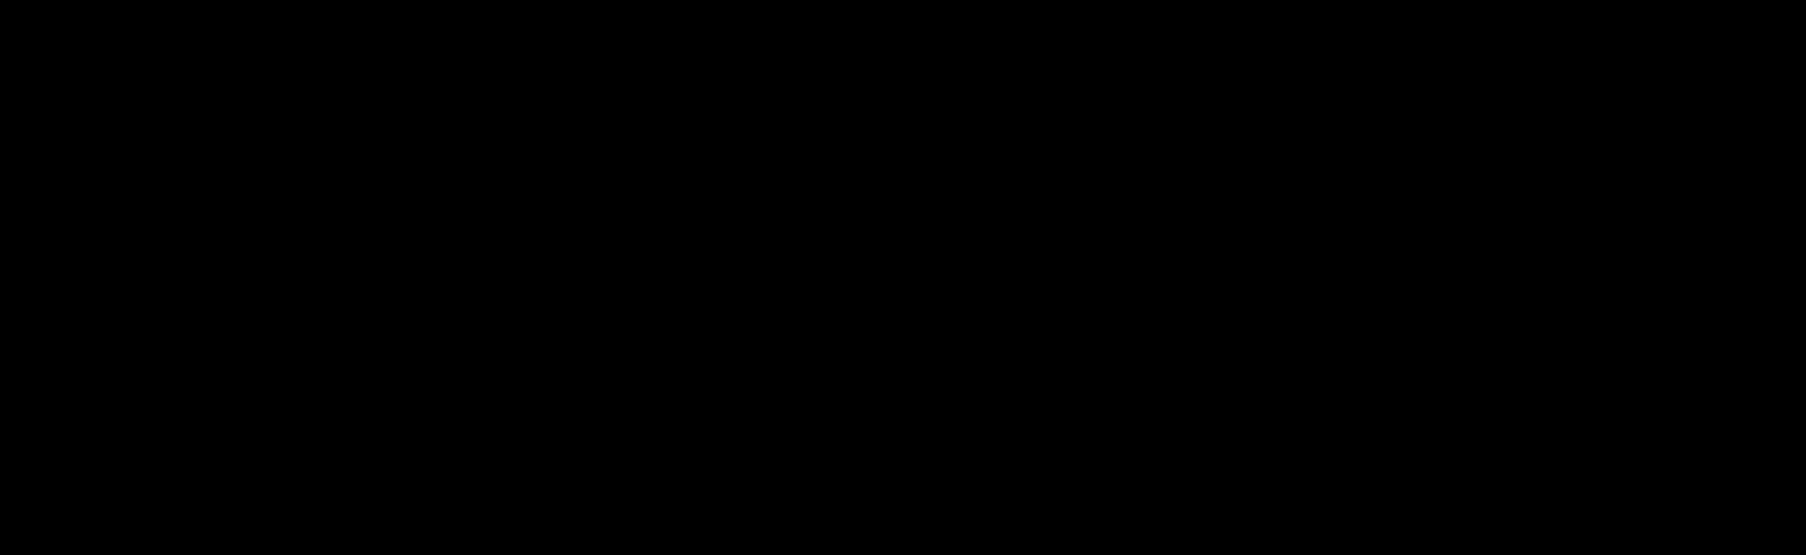 COON Logo Horiz_CMYK - Transparent